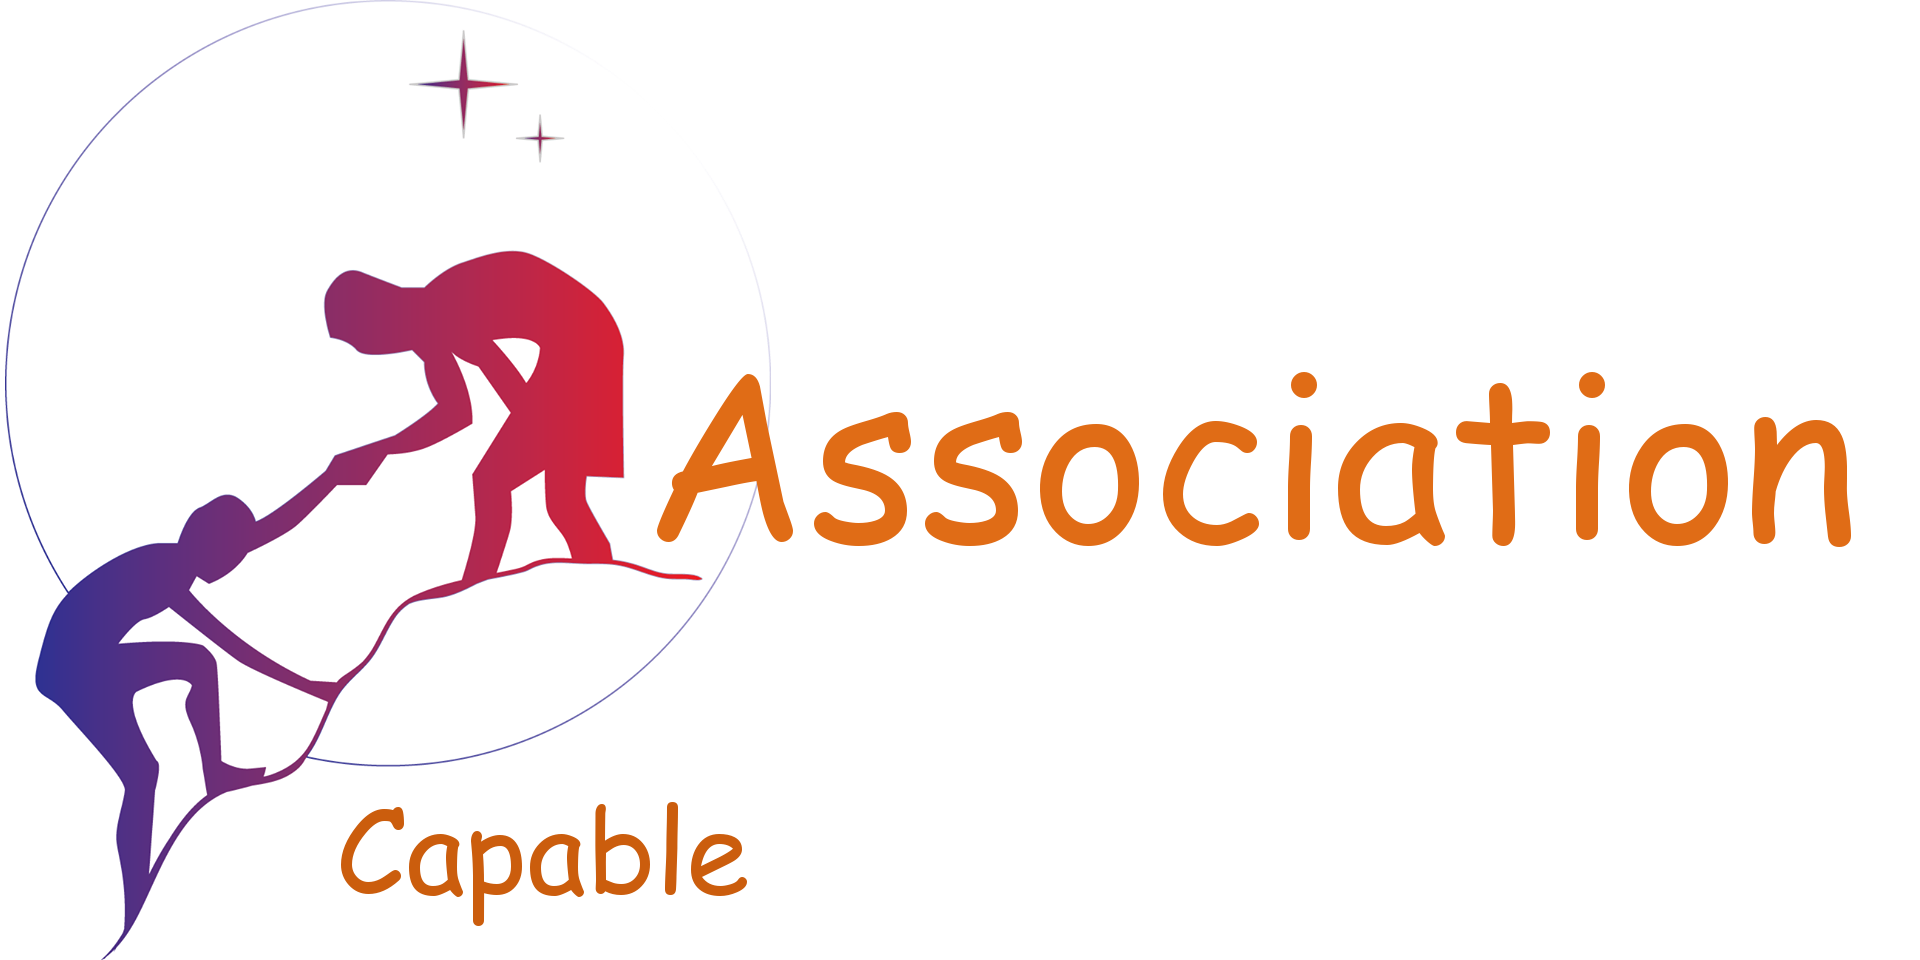 Association Capable